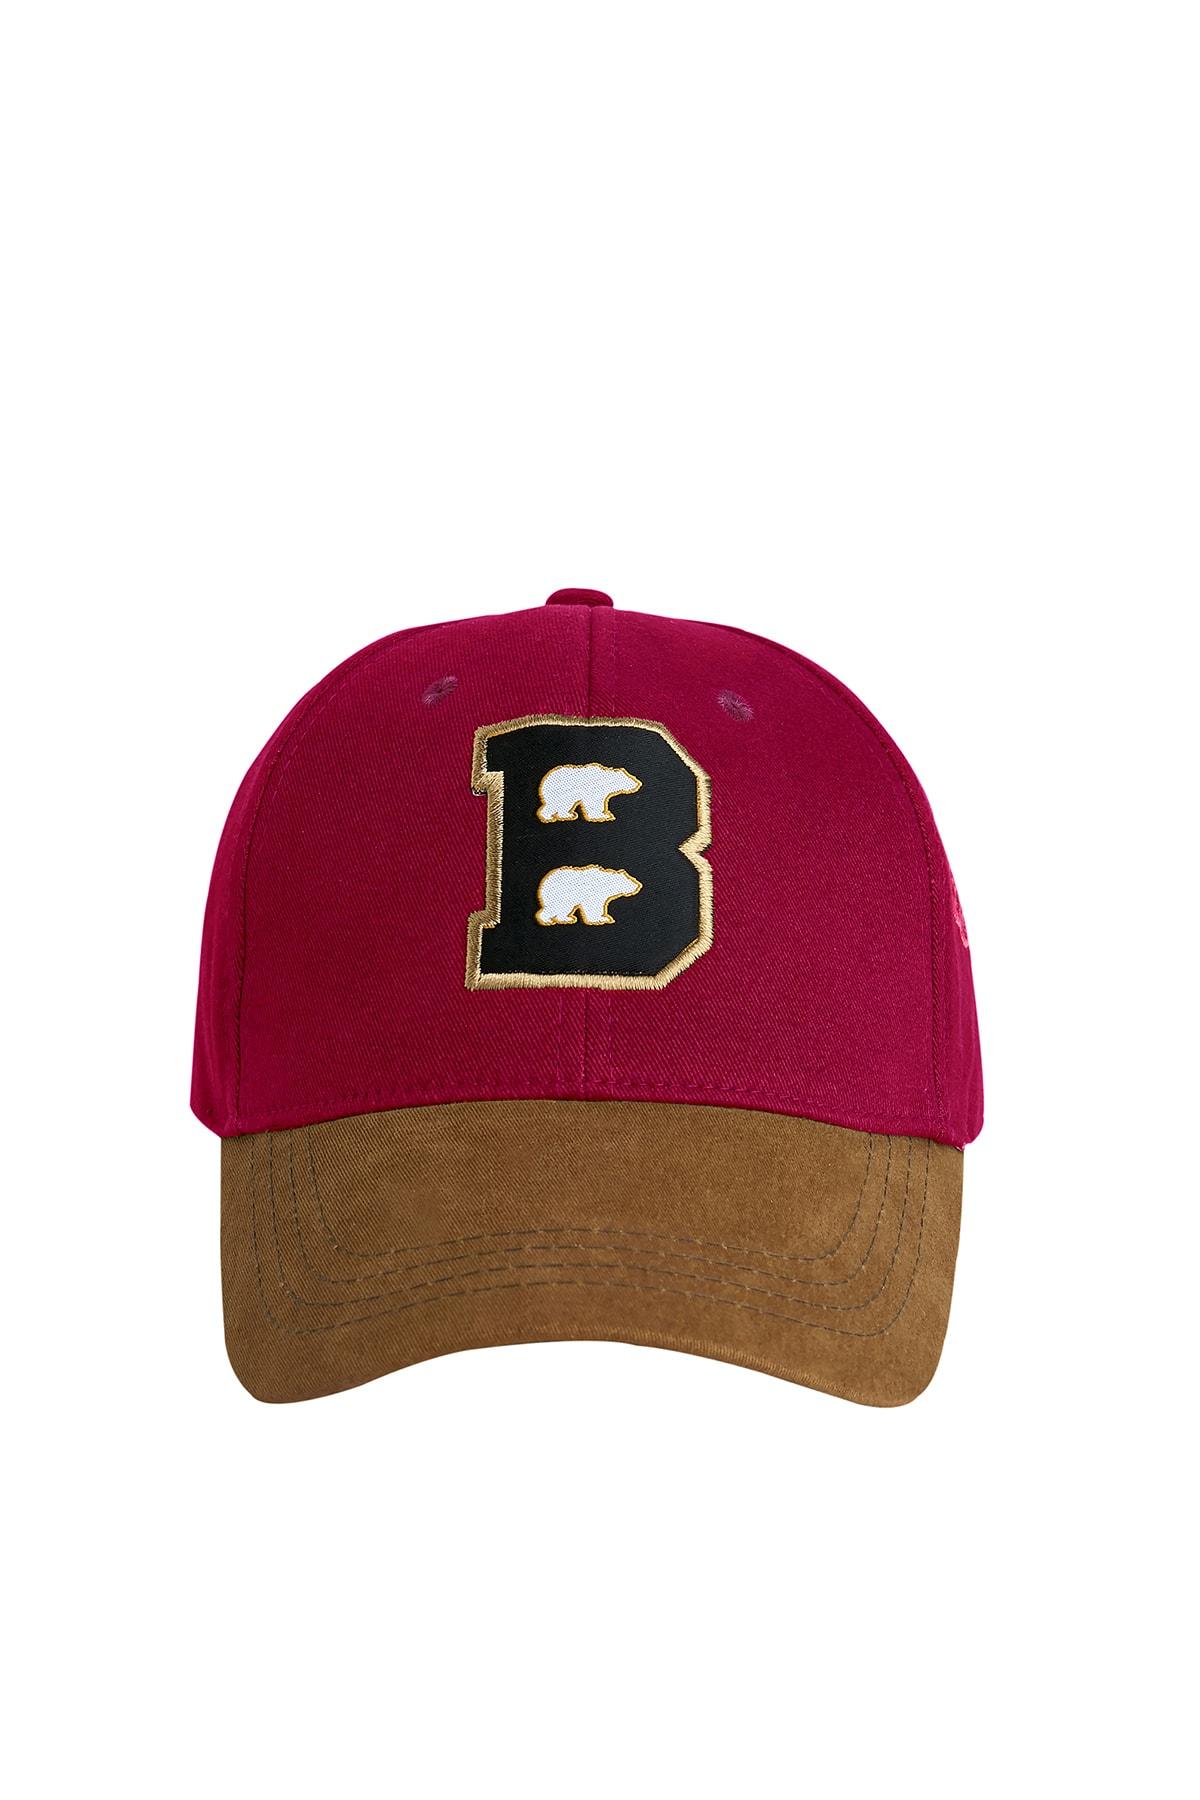 Bad Bear Braın Cap Bordo Spor Şapka 1